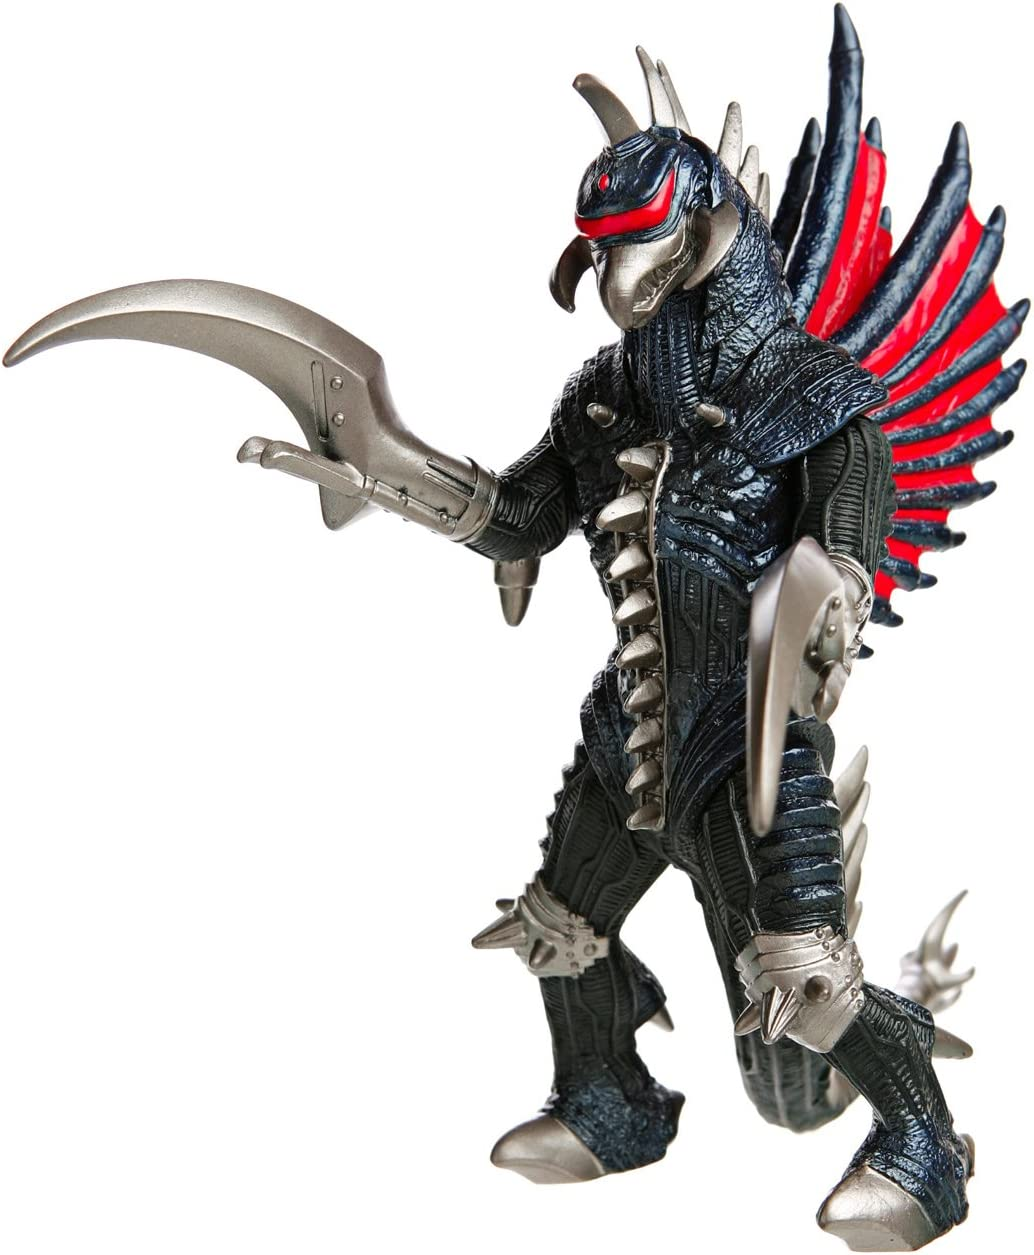 Godzilla 6.5 inch Action Figure Gigan Final Wars 2004